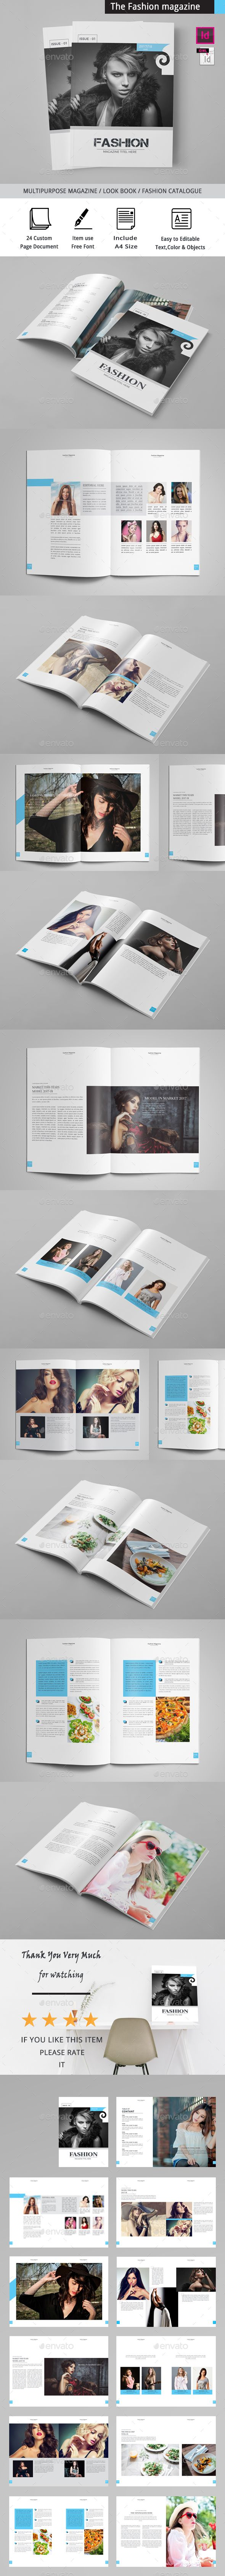 The Fashion Magazine — InDesign INDD #fashion #designer • Download ➝ https://graphicriver.net/item/the-fashion-magazine/19637429?ref=pxcr